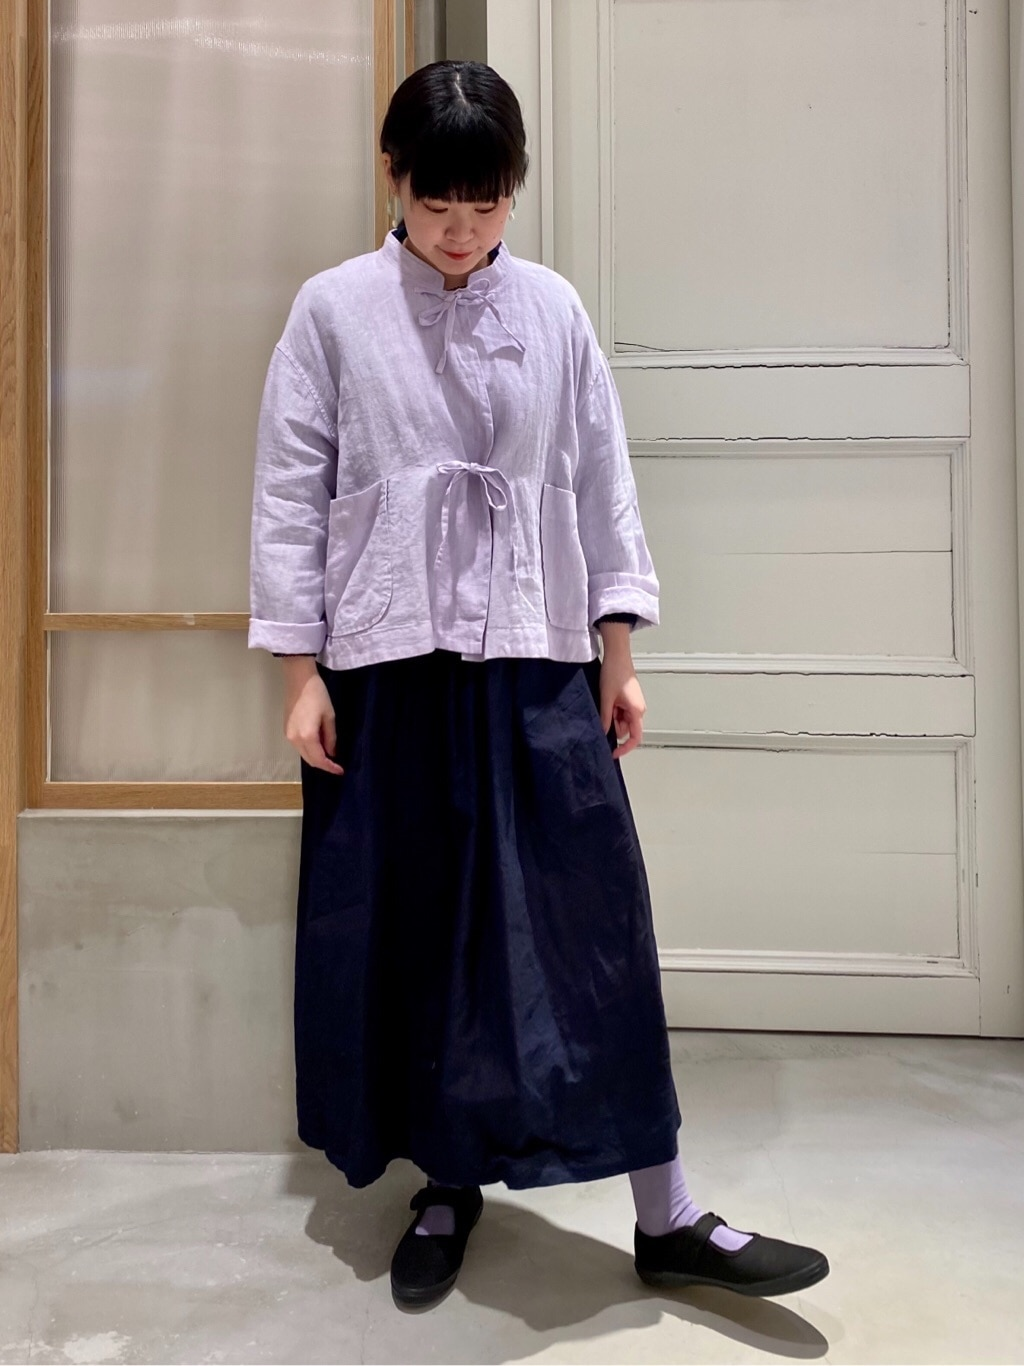 bulle de savon 渋谷スクランブルスクエア 身長:158cm 2021.03.13